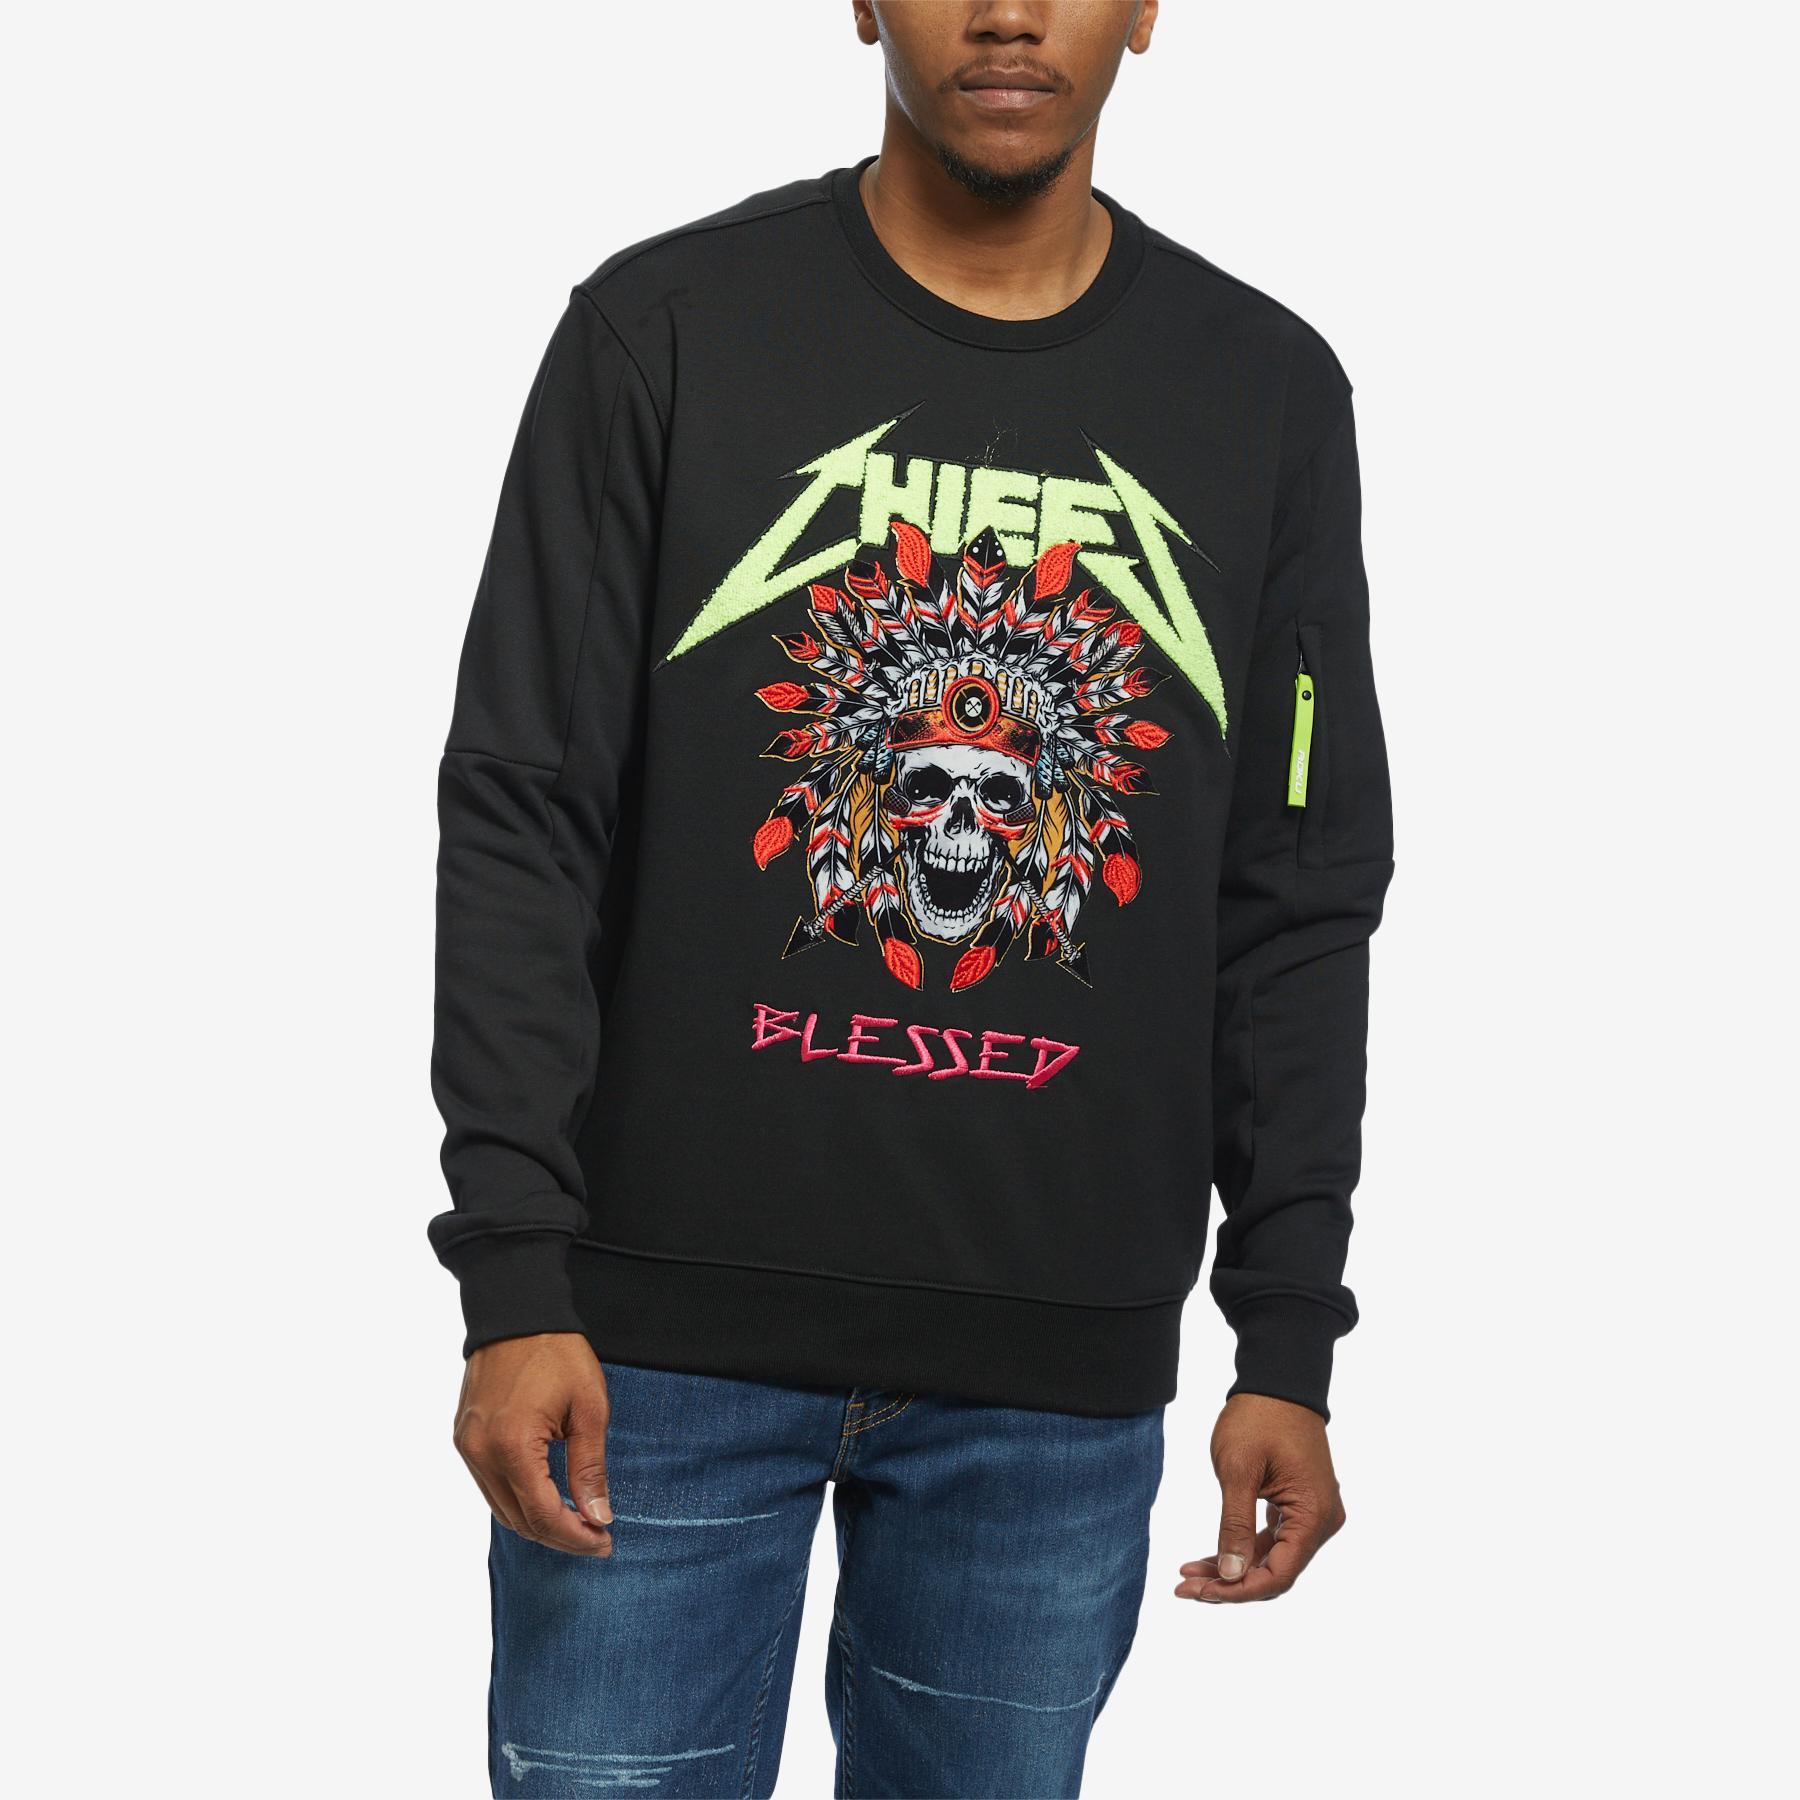 Men's Chiefs Blessed Sweatshirt